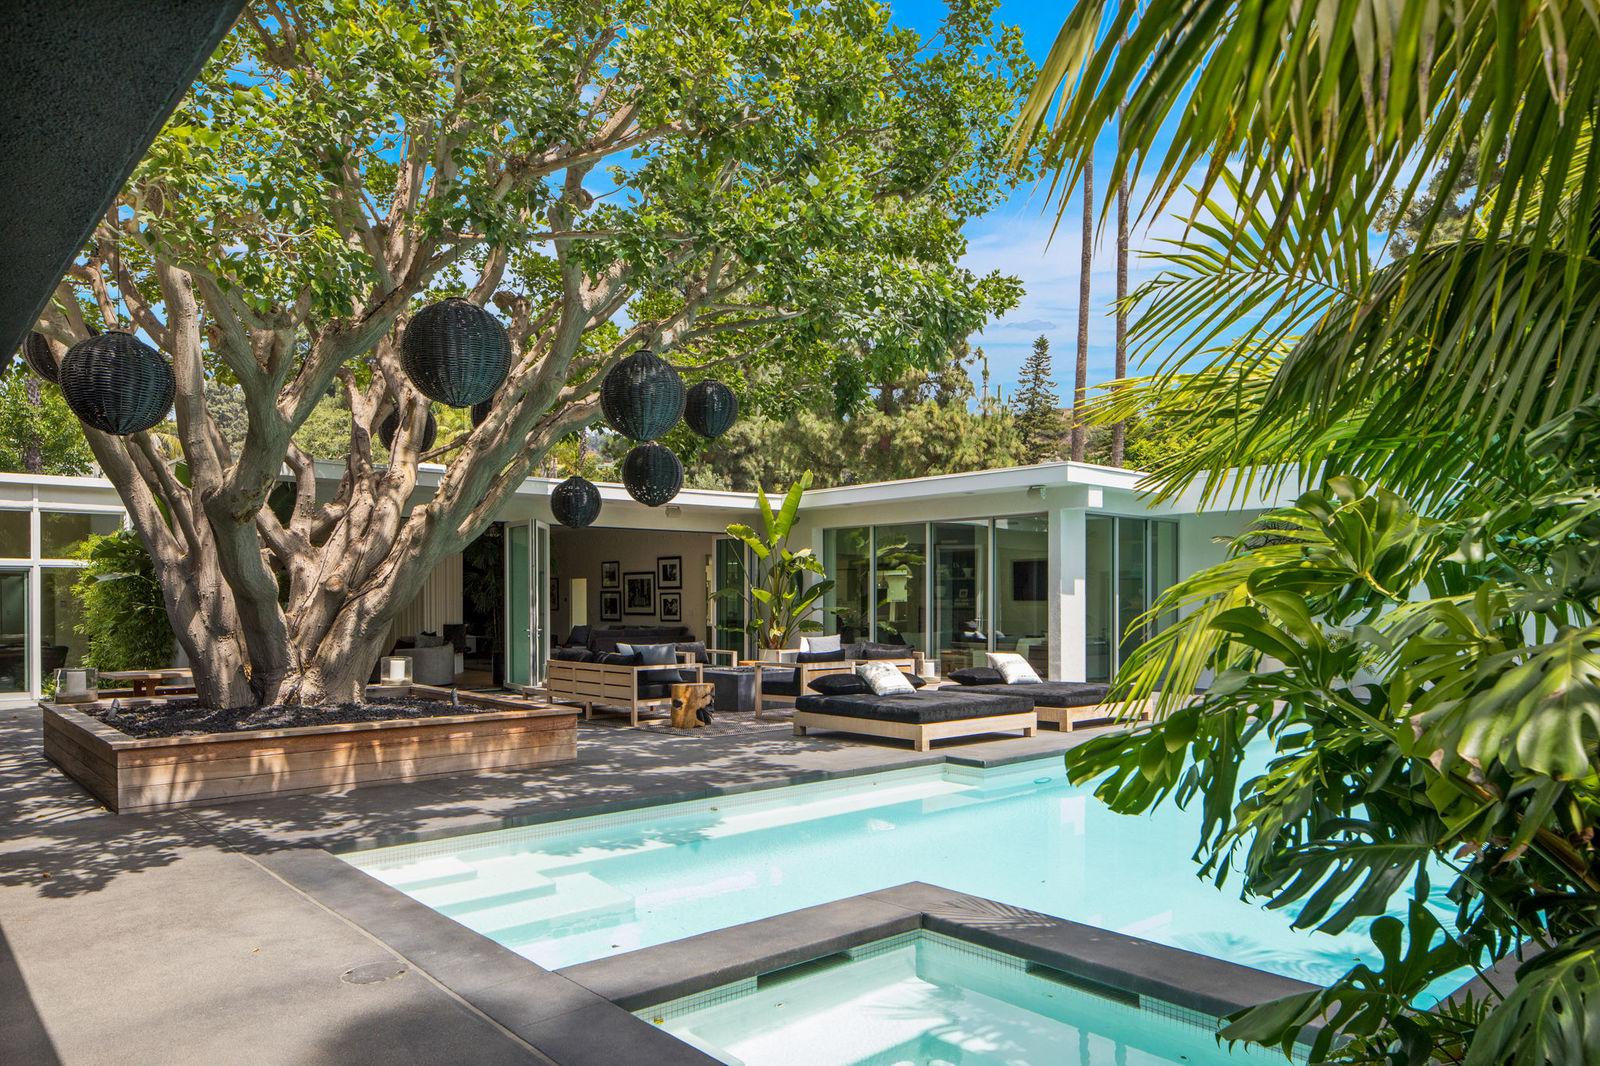 Vista de la piscina de Cindy Crawford. / Foto: Oasisonlomavista